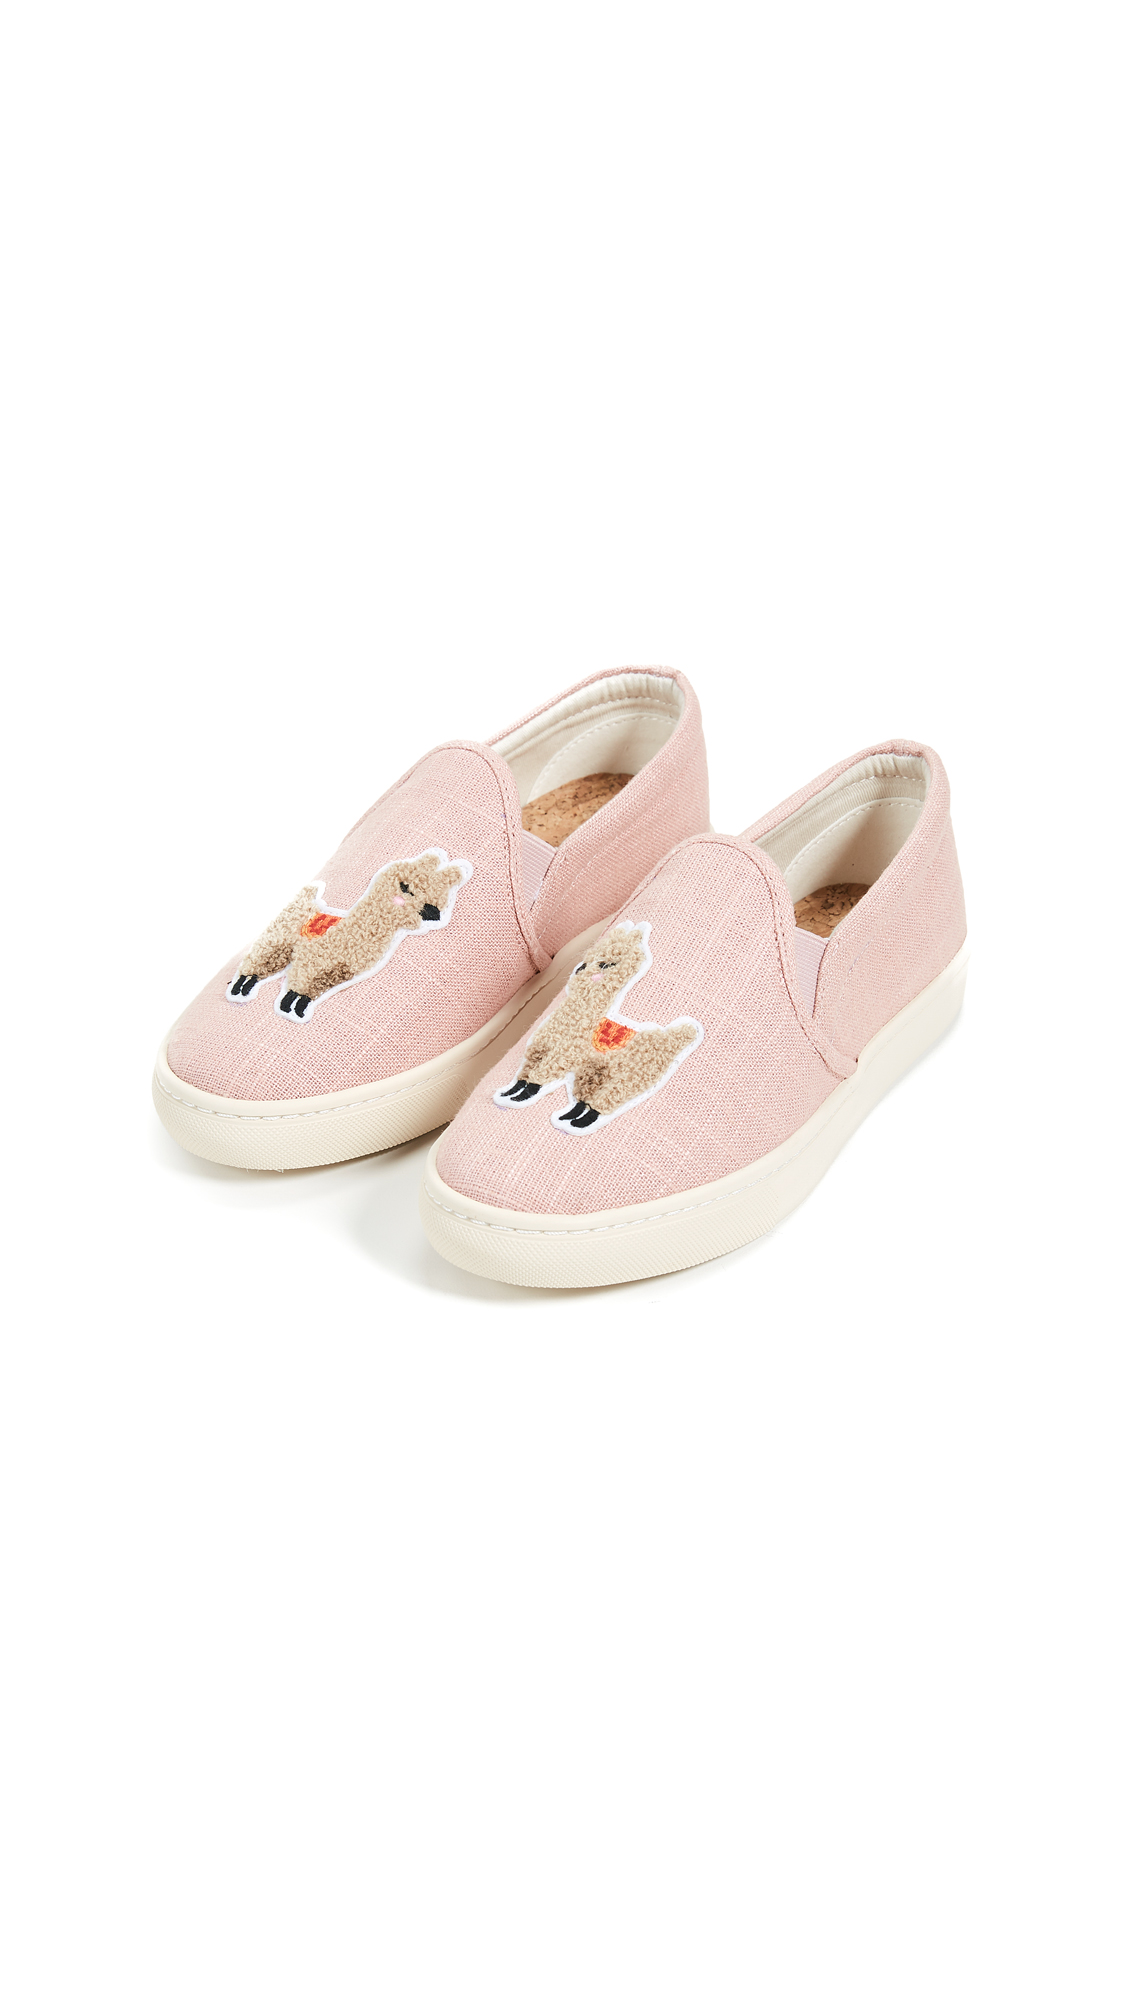 Soludos Llama Slip On Sneakers - Dusty Rose